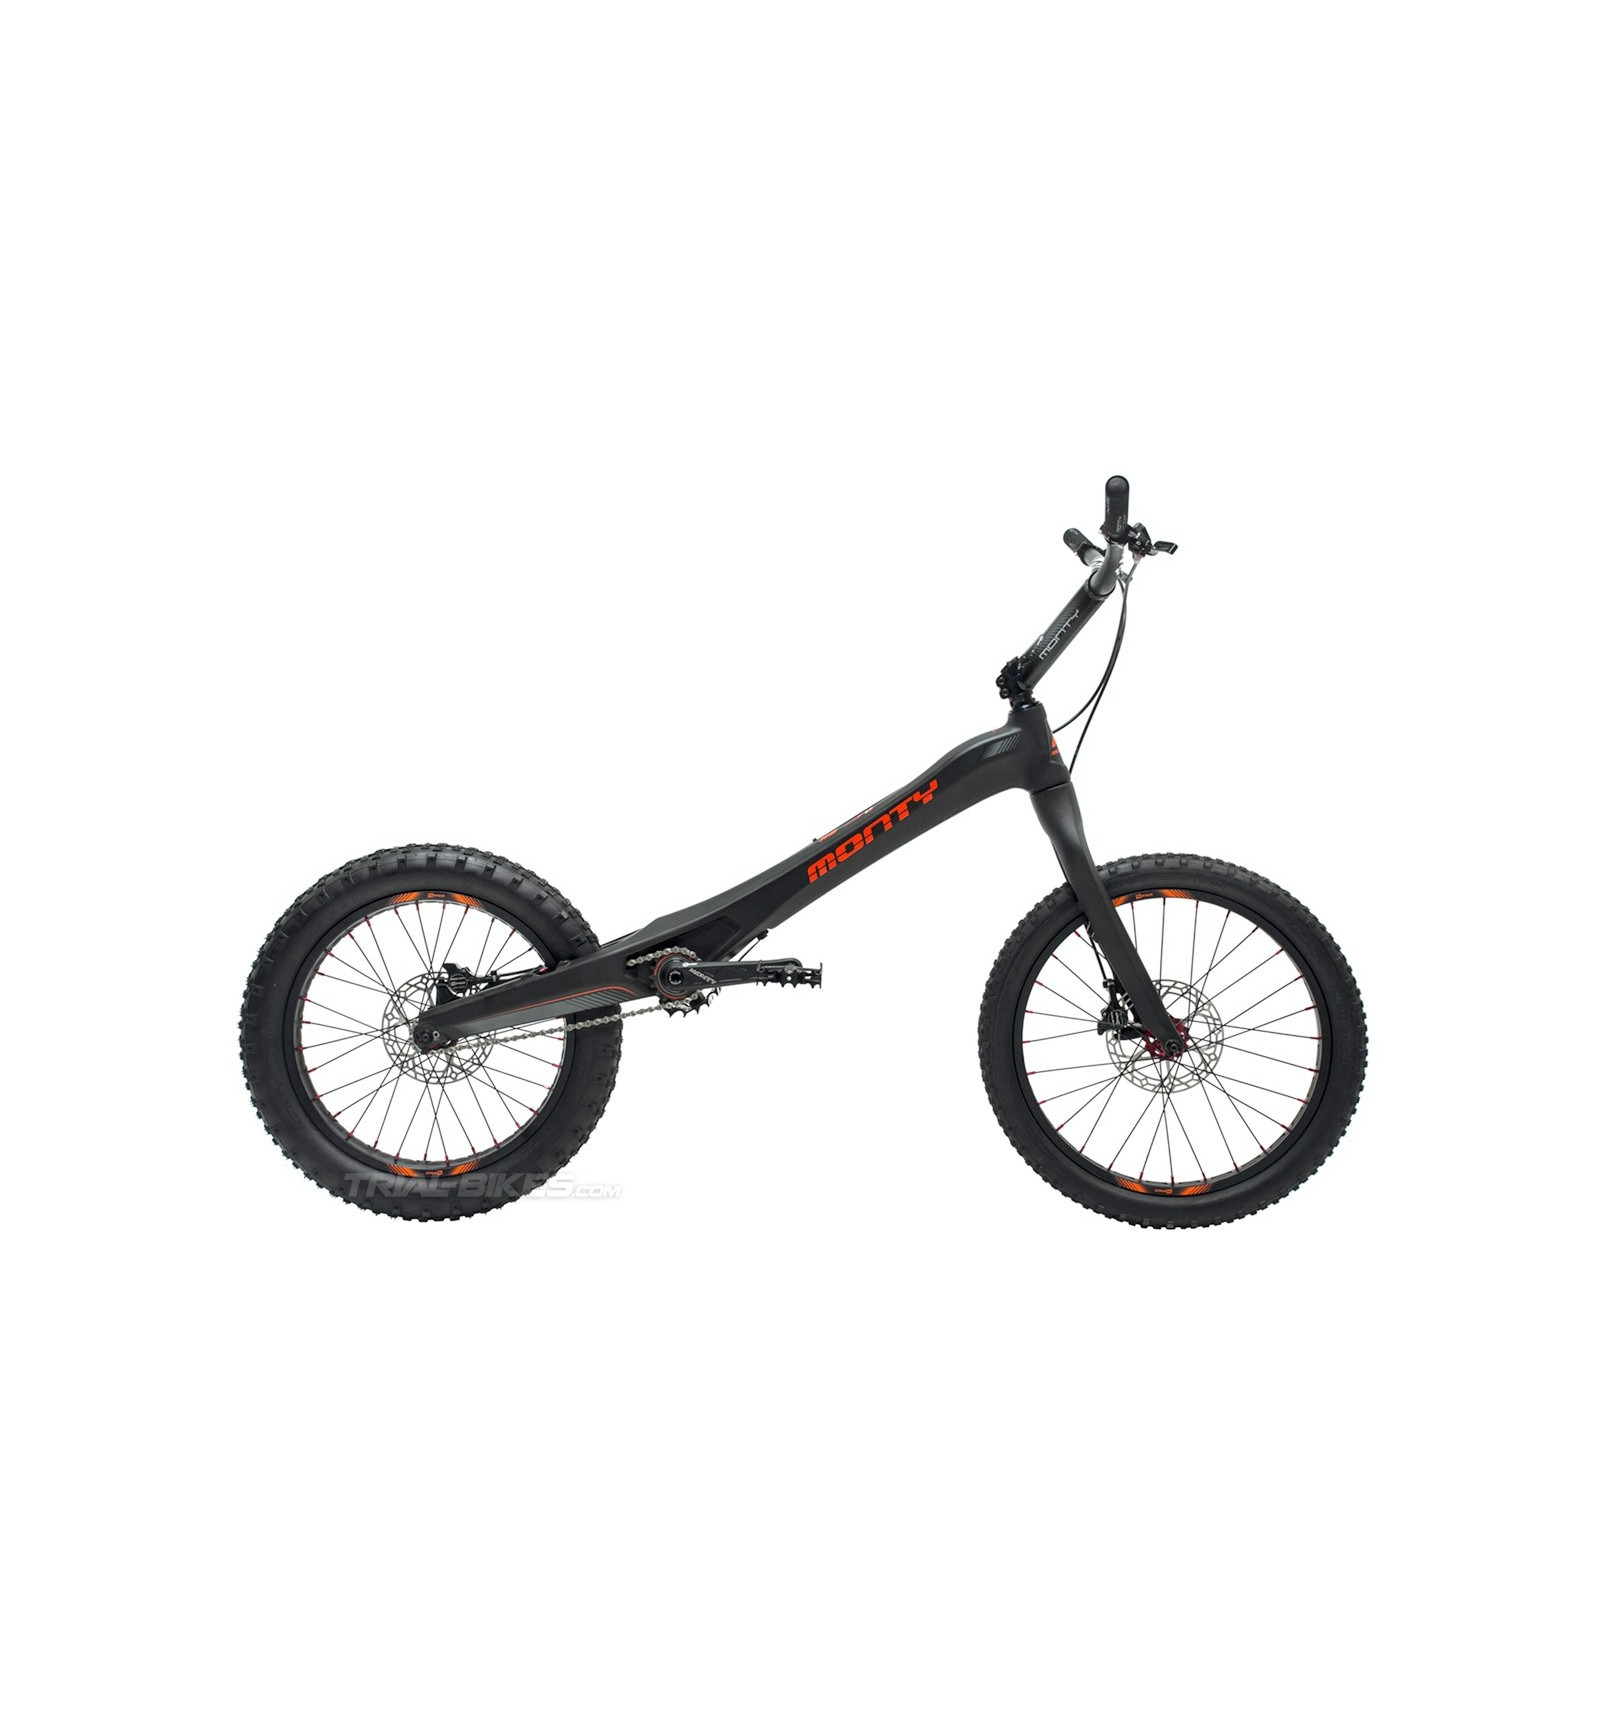 Bicicletas - Trial-Bikes